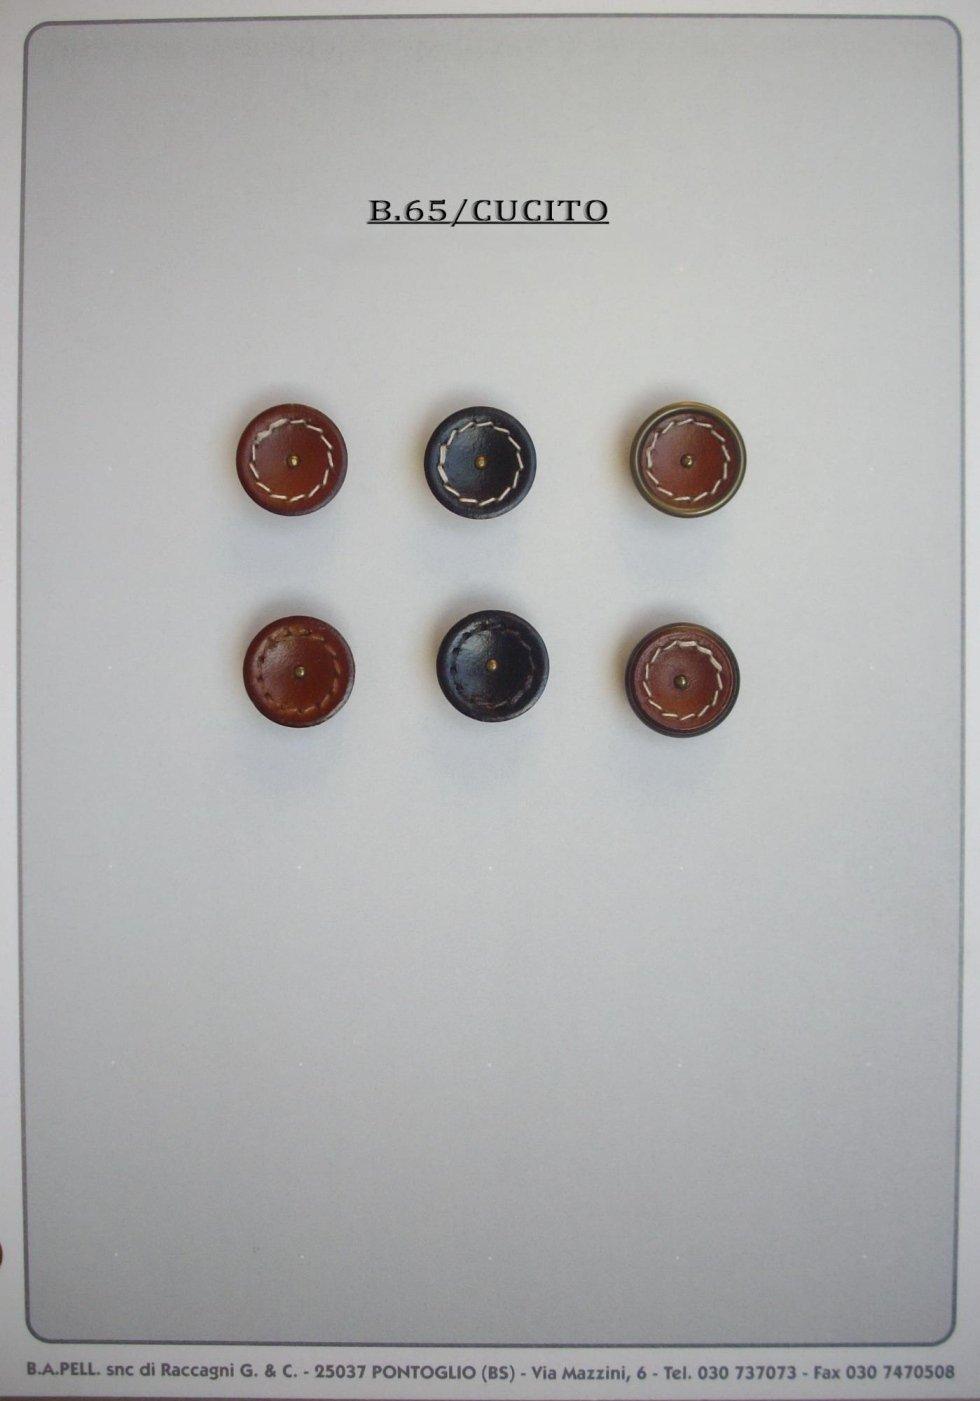 B.65 cucito